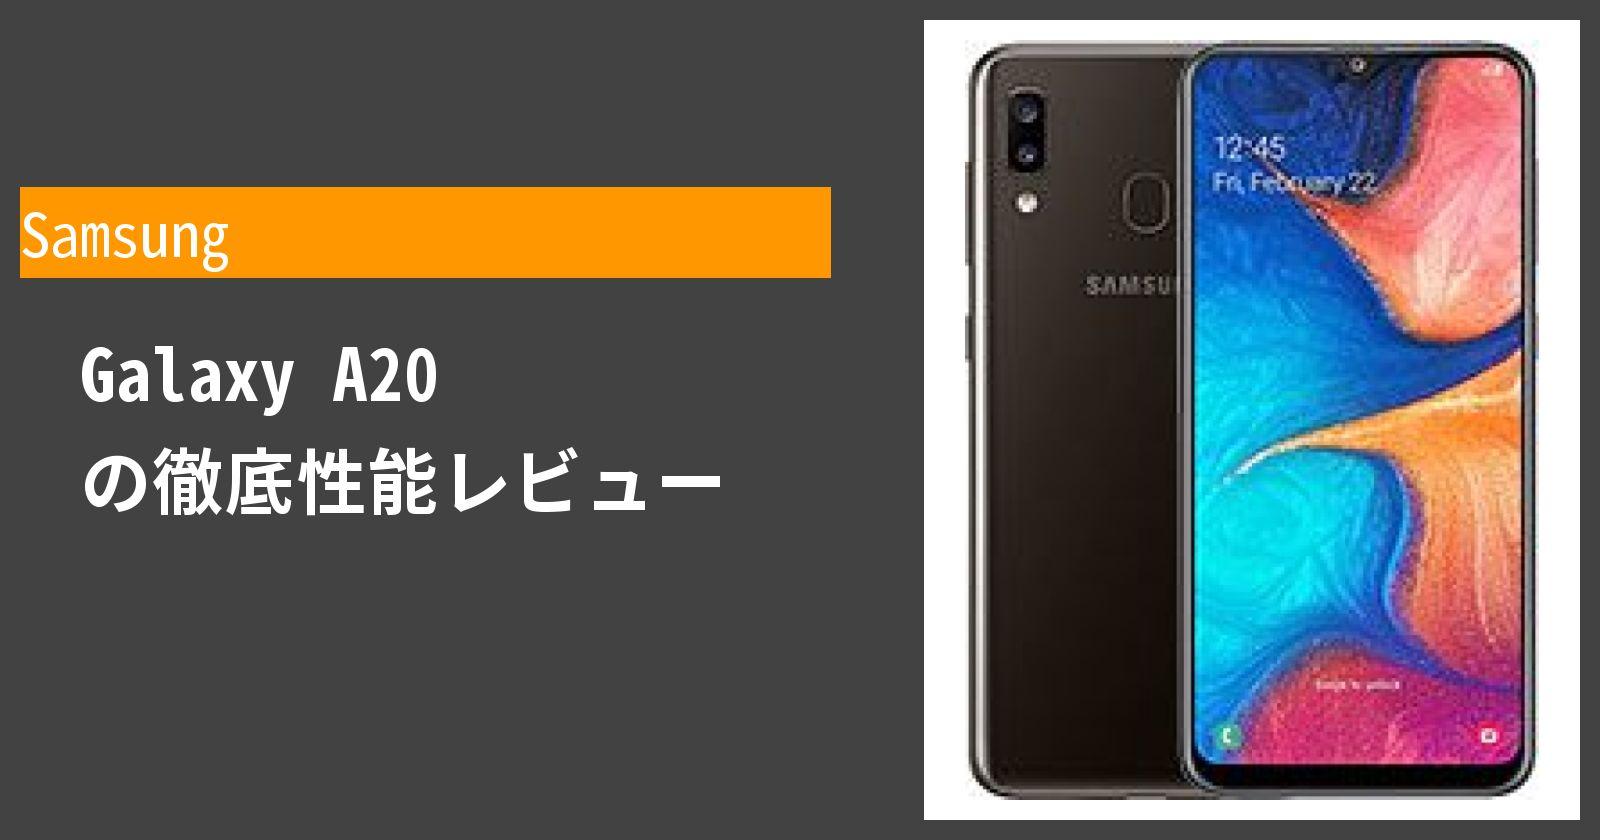 Galaxy A20 の徹底性能レビュー